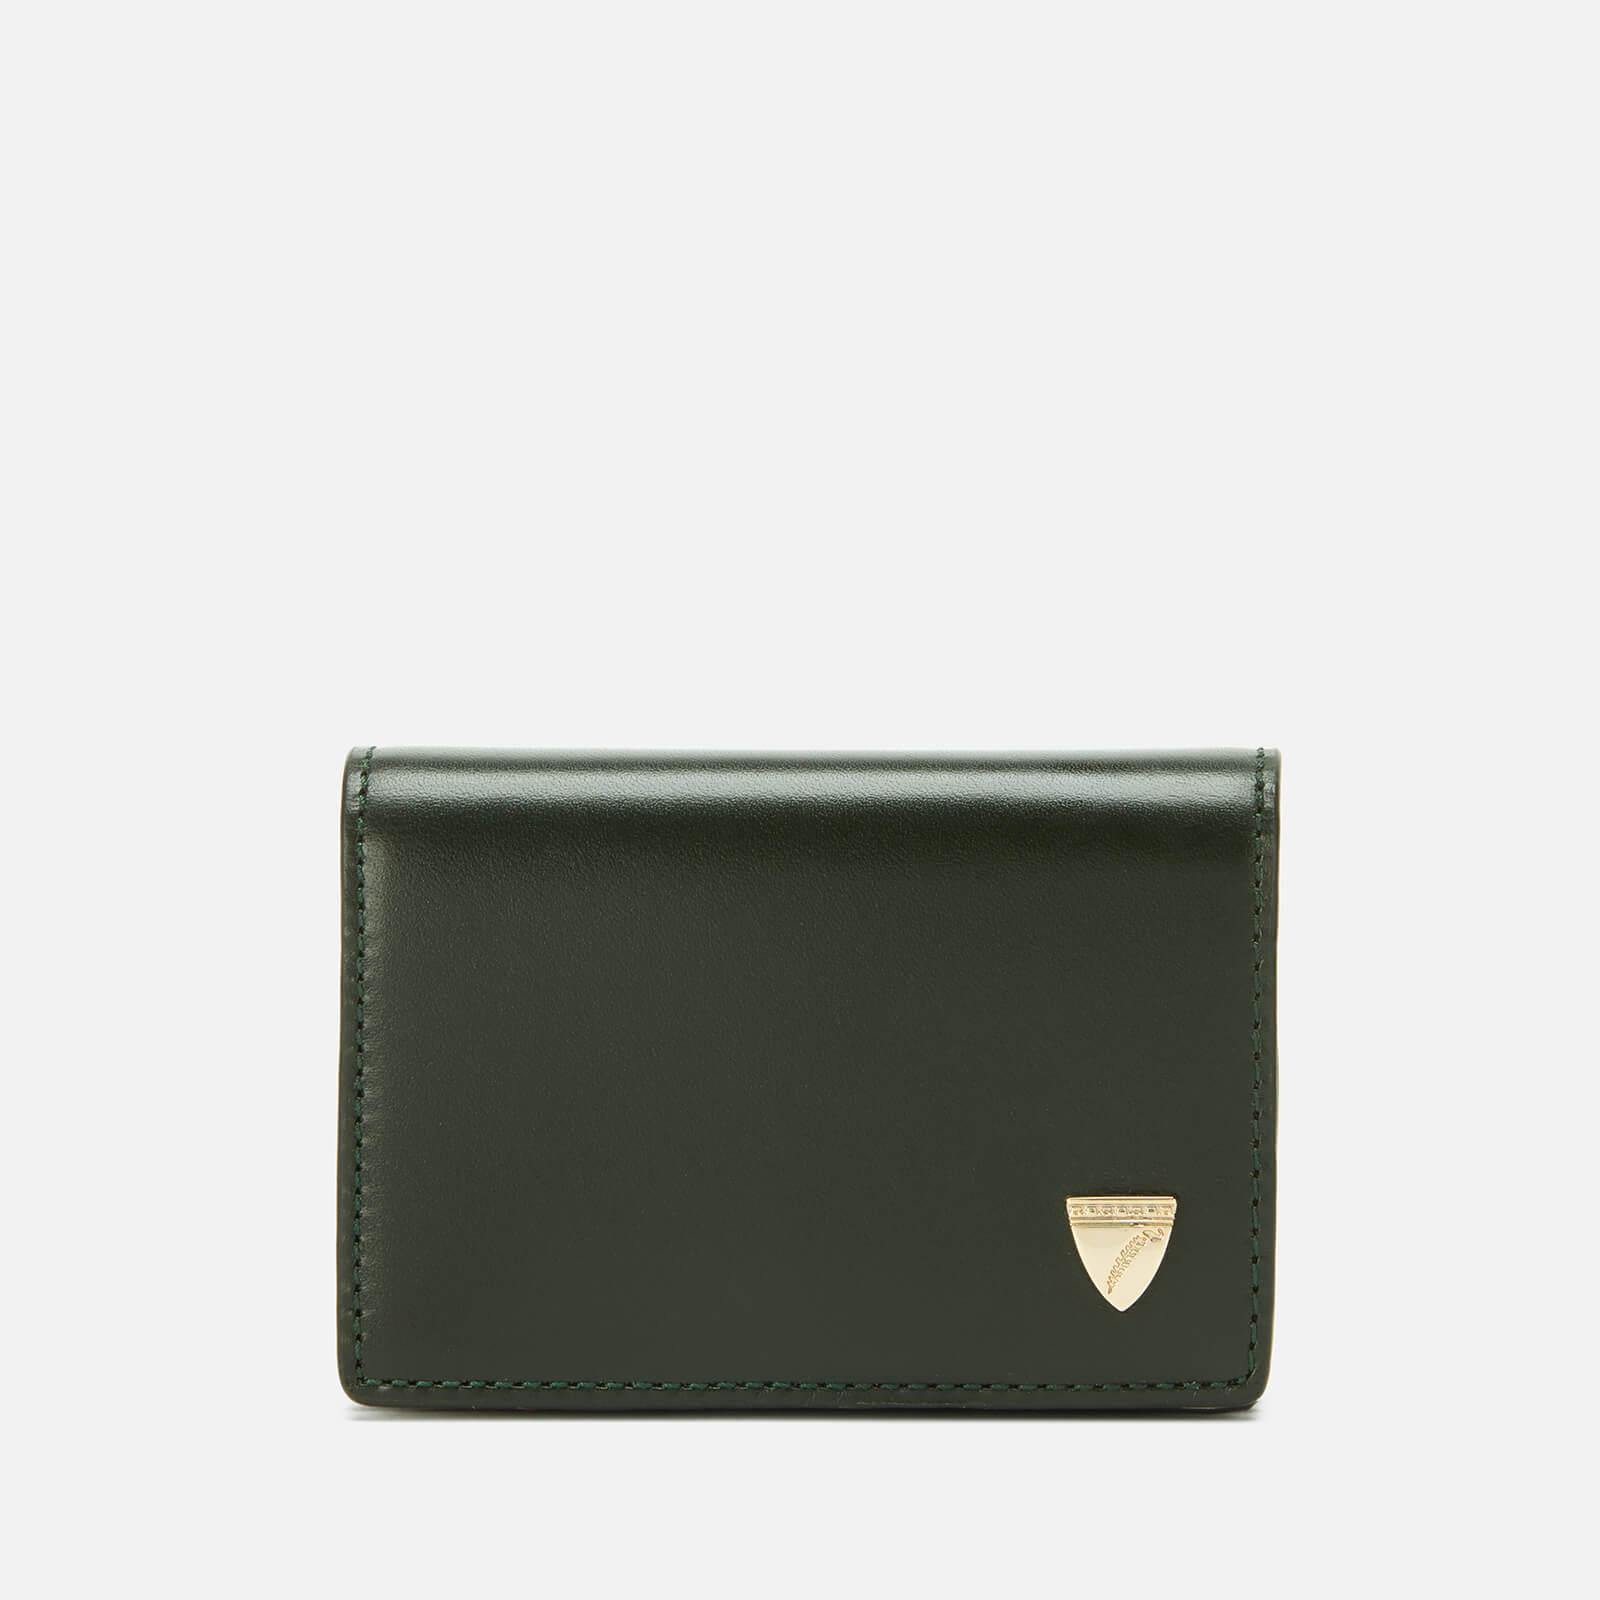 Aspinal of London Women's Accordion Card Case - Black/Evergreen/Peony